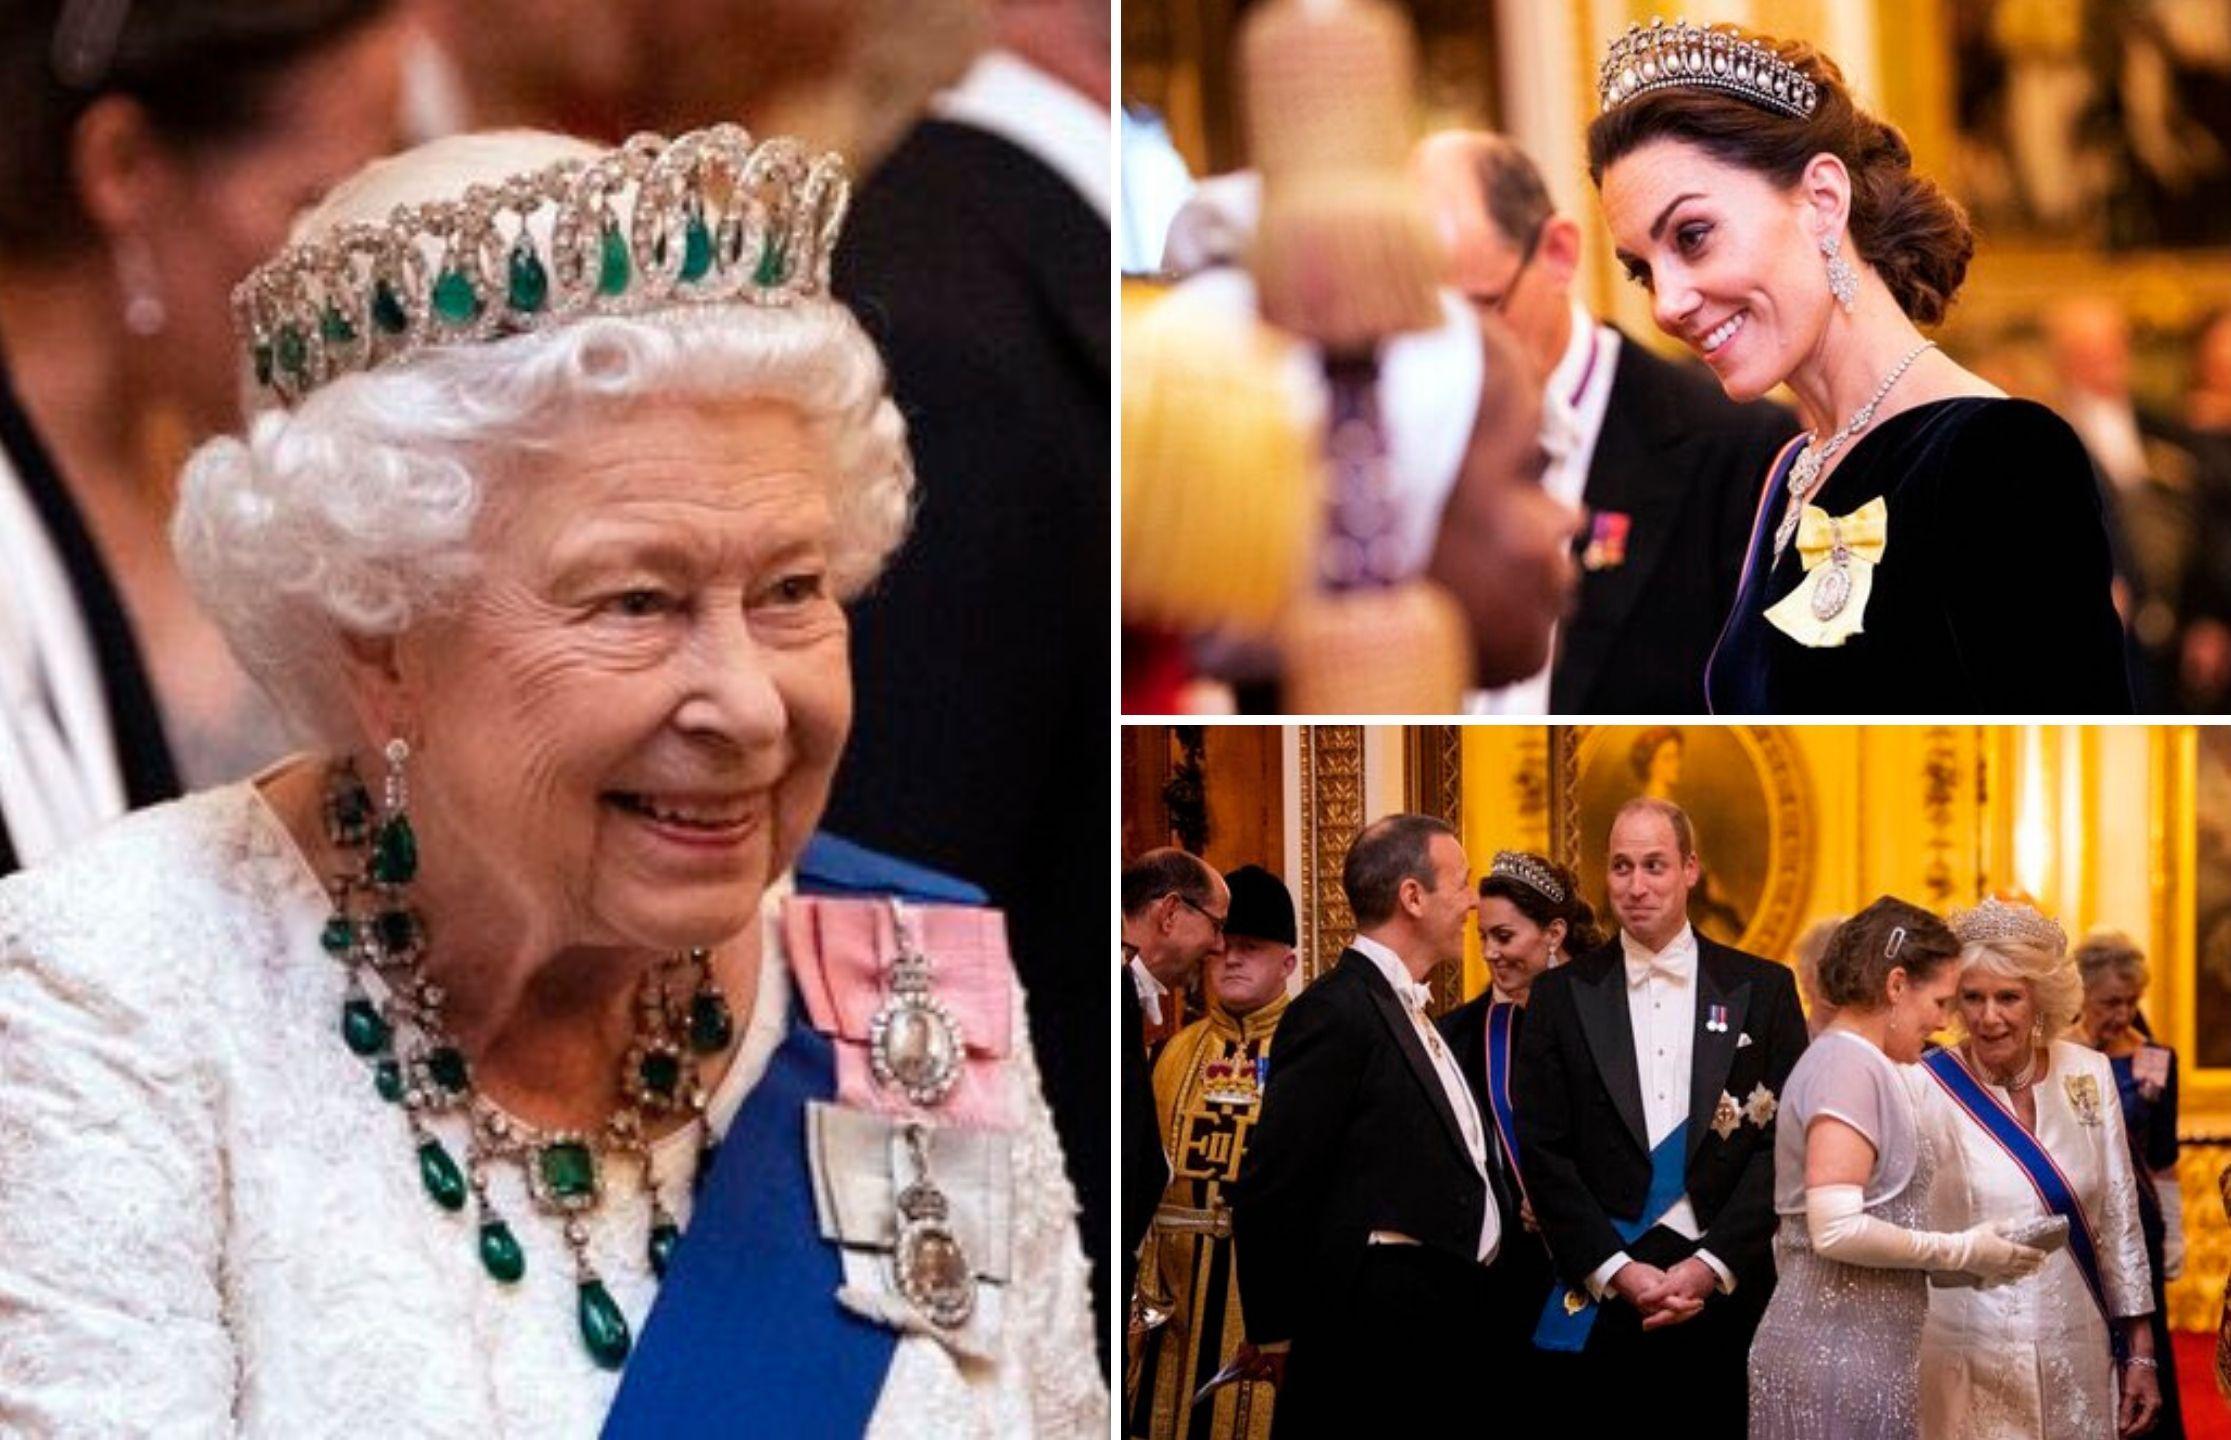 Emeralds & diamonds galore at the Diplomatic Corps reception tonight